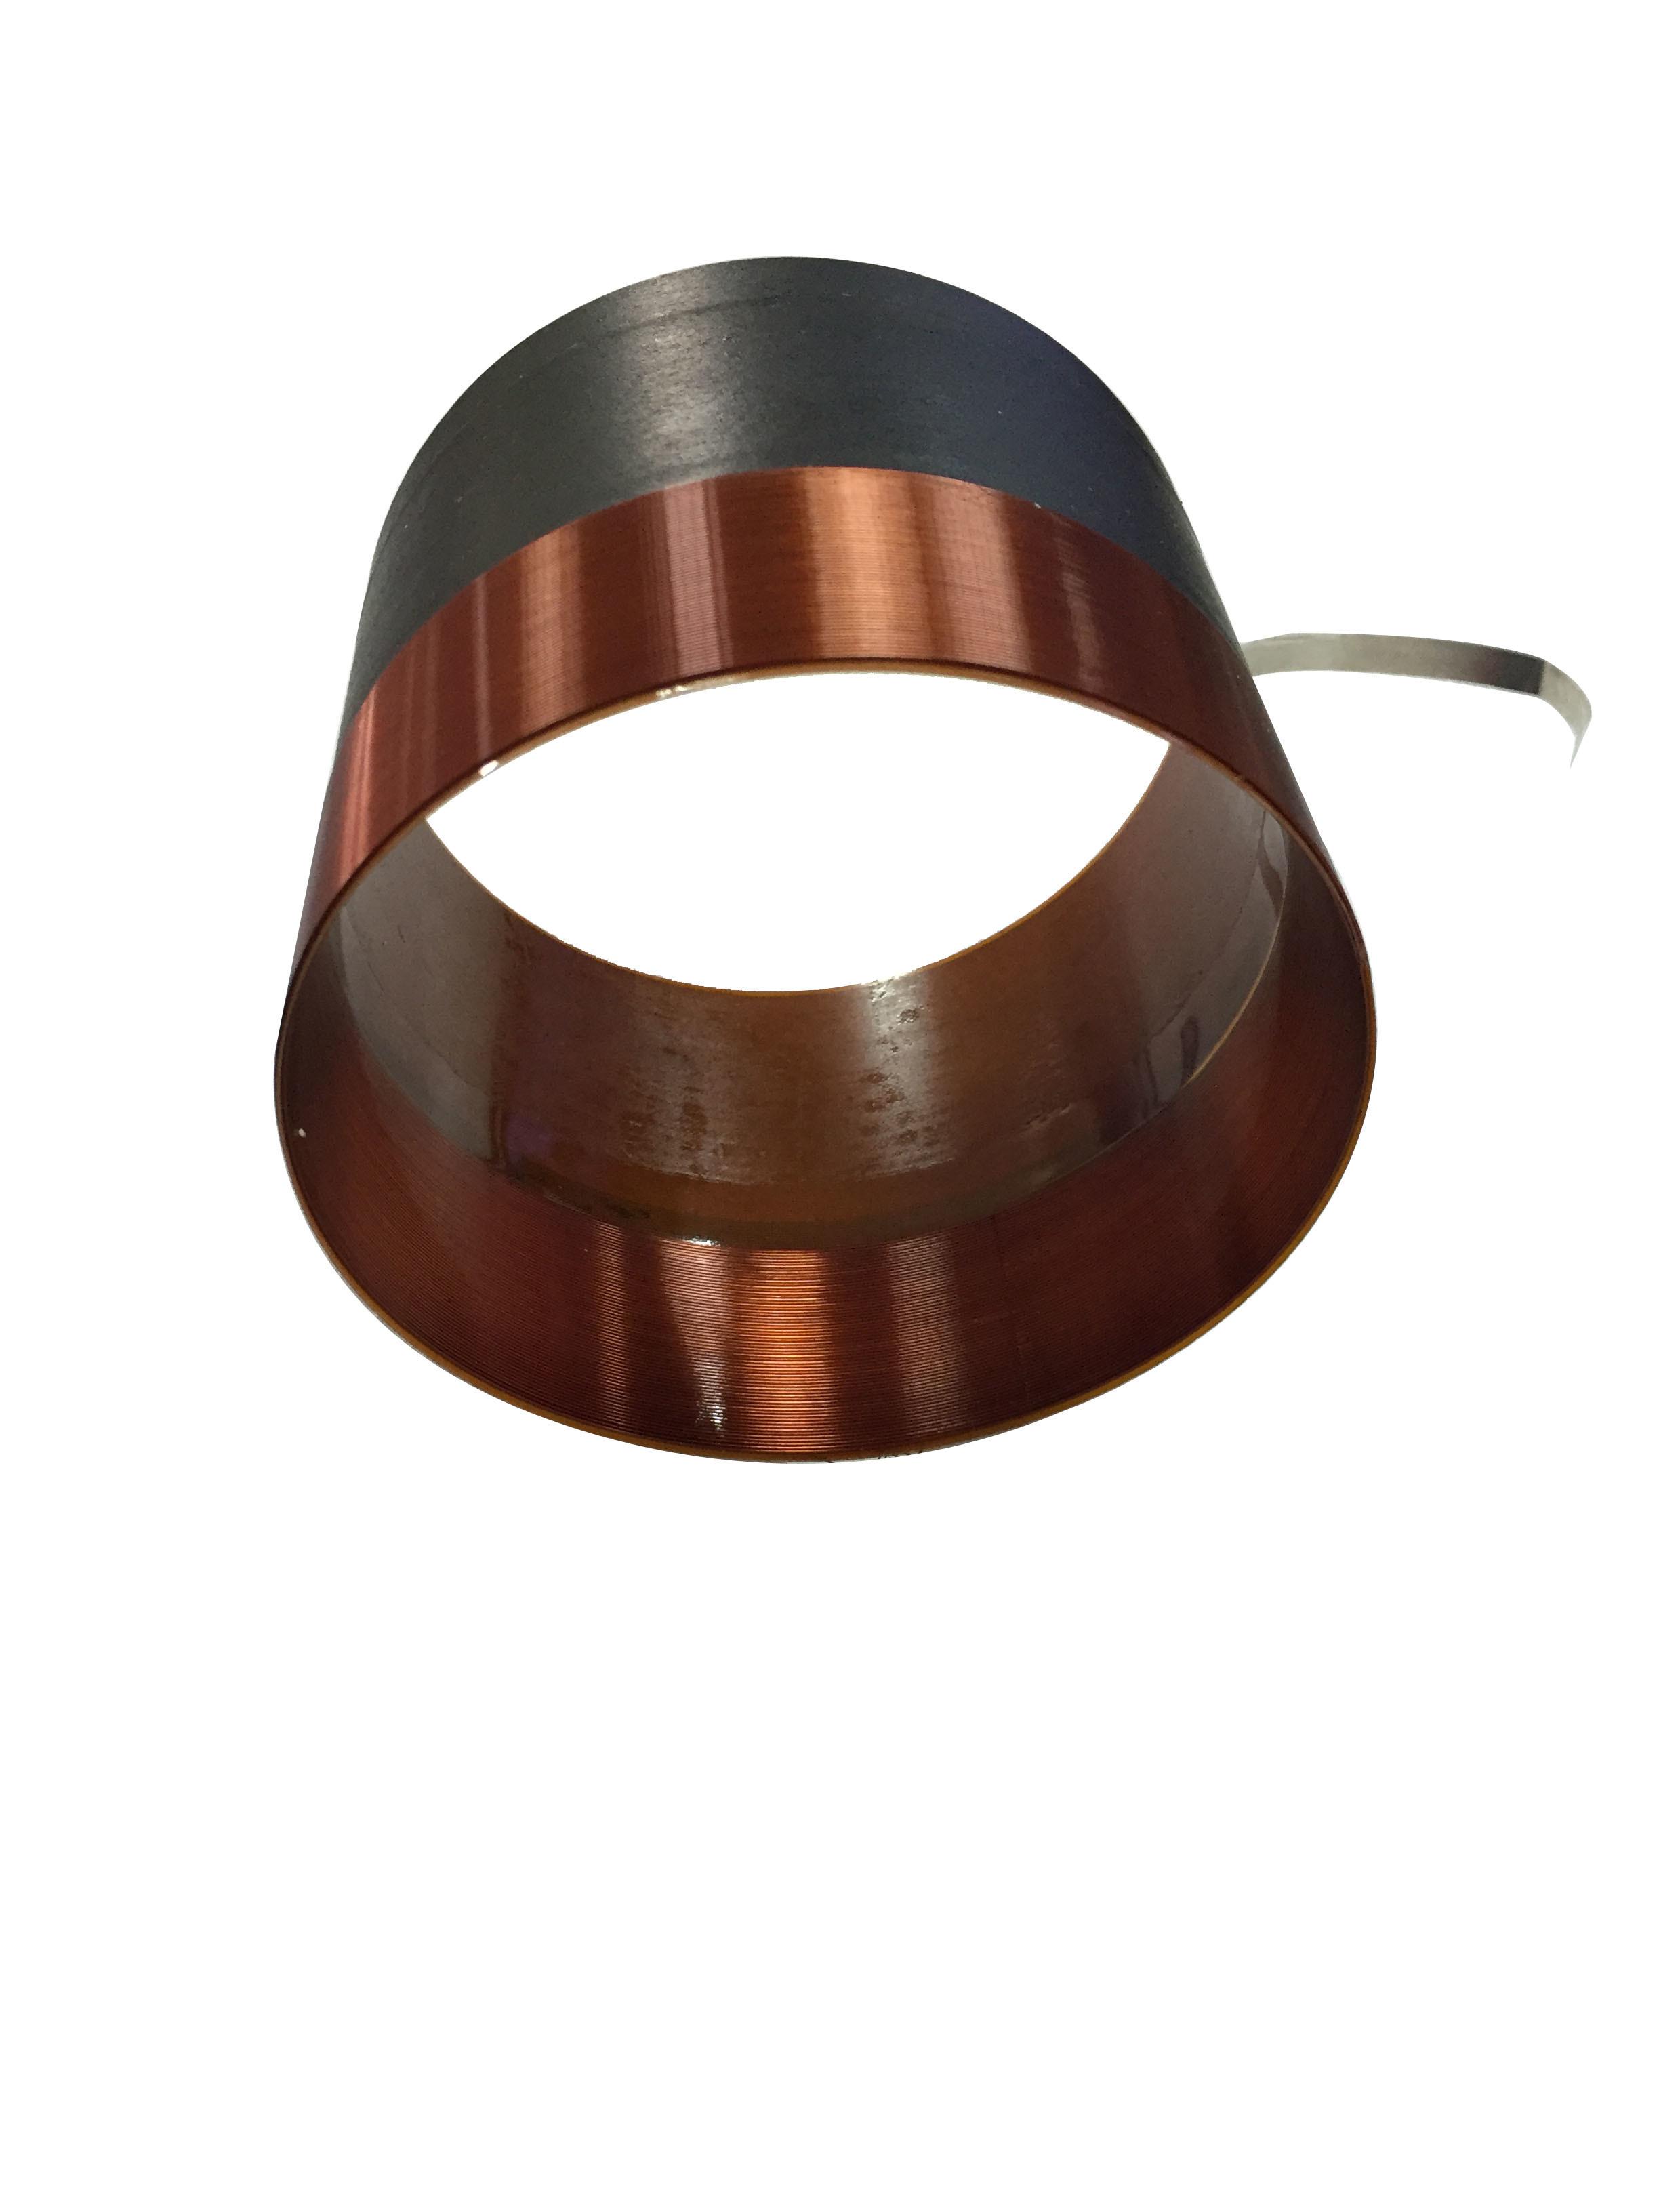 High Quality Lound Speaker Voice Coil - Speaker Parts